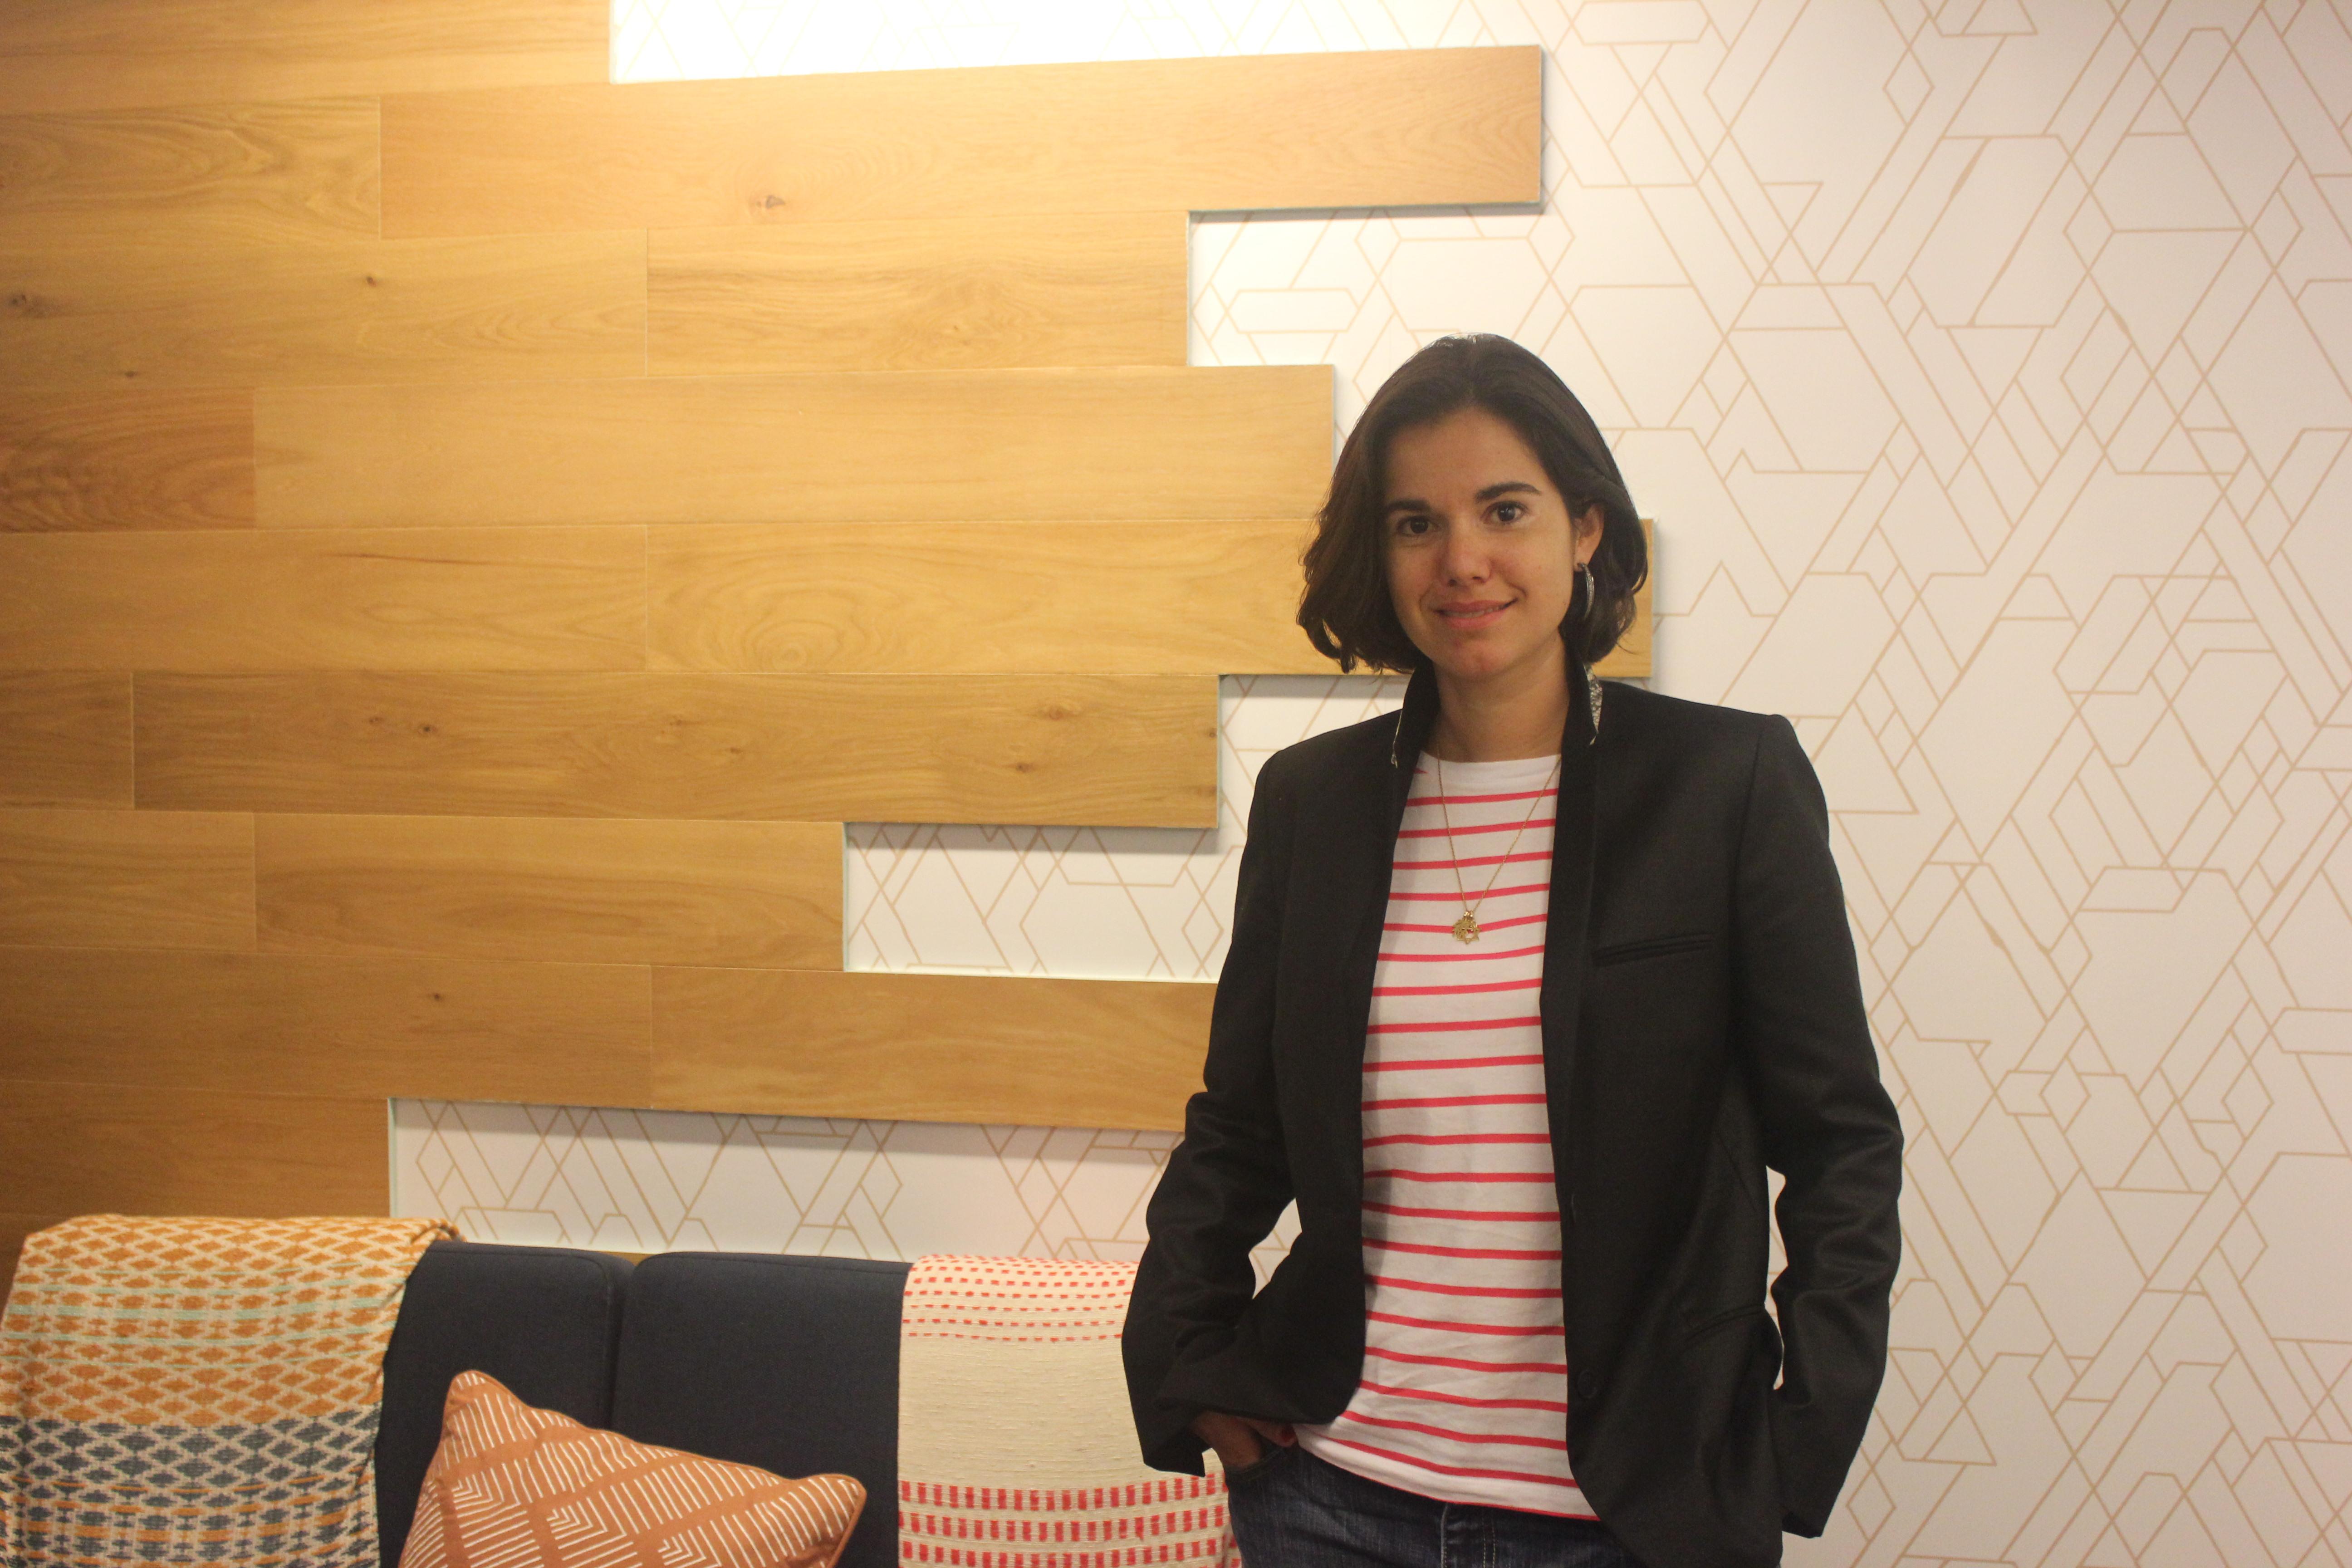 Karen Farzam of WHub in Hong Kong